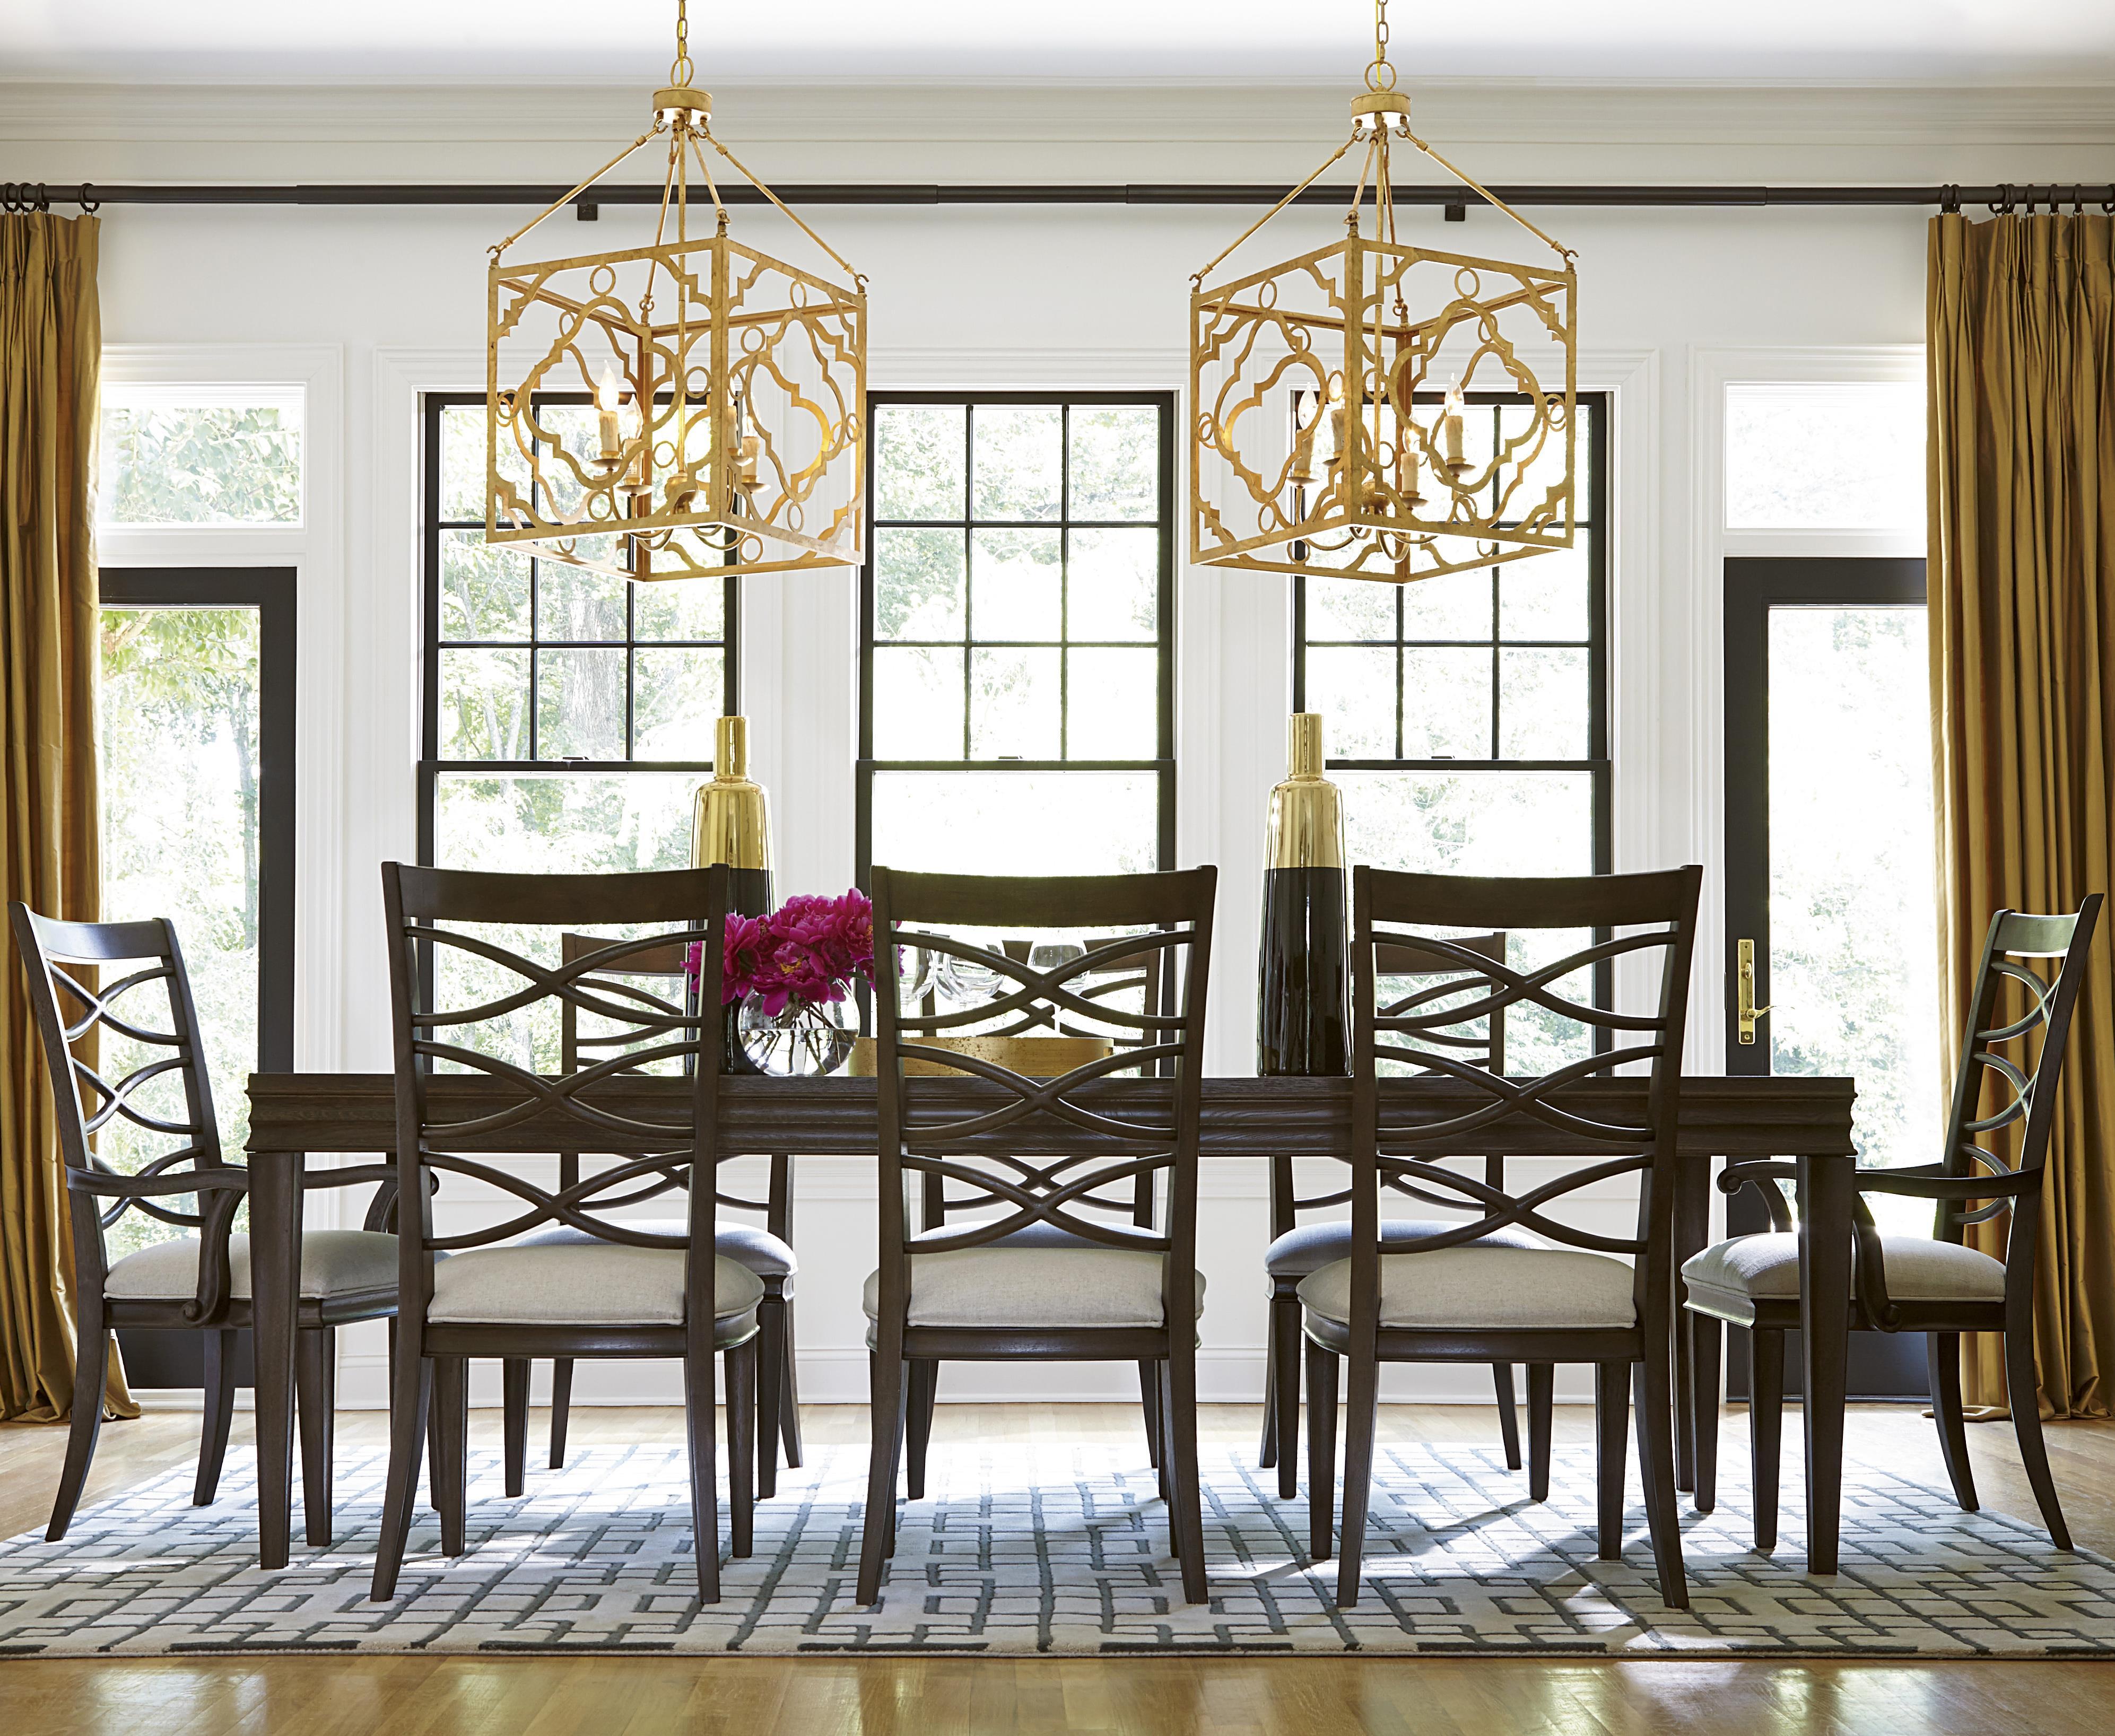 Universal California - Hollywood Hills 9 Piece Dining Set - Item Number: 475653+2x635-RTA+6x634-RTA